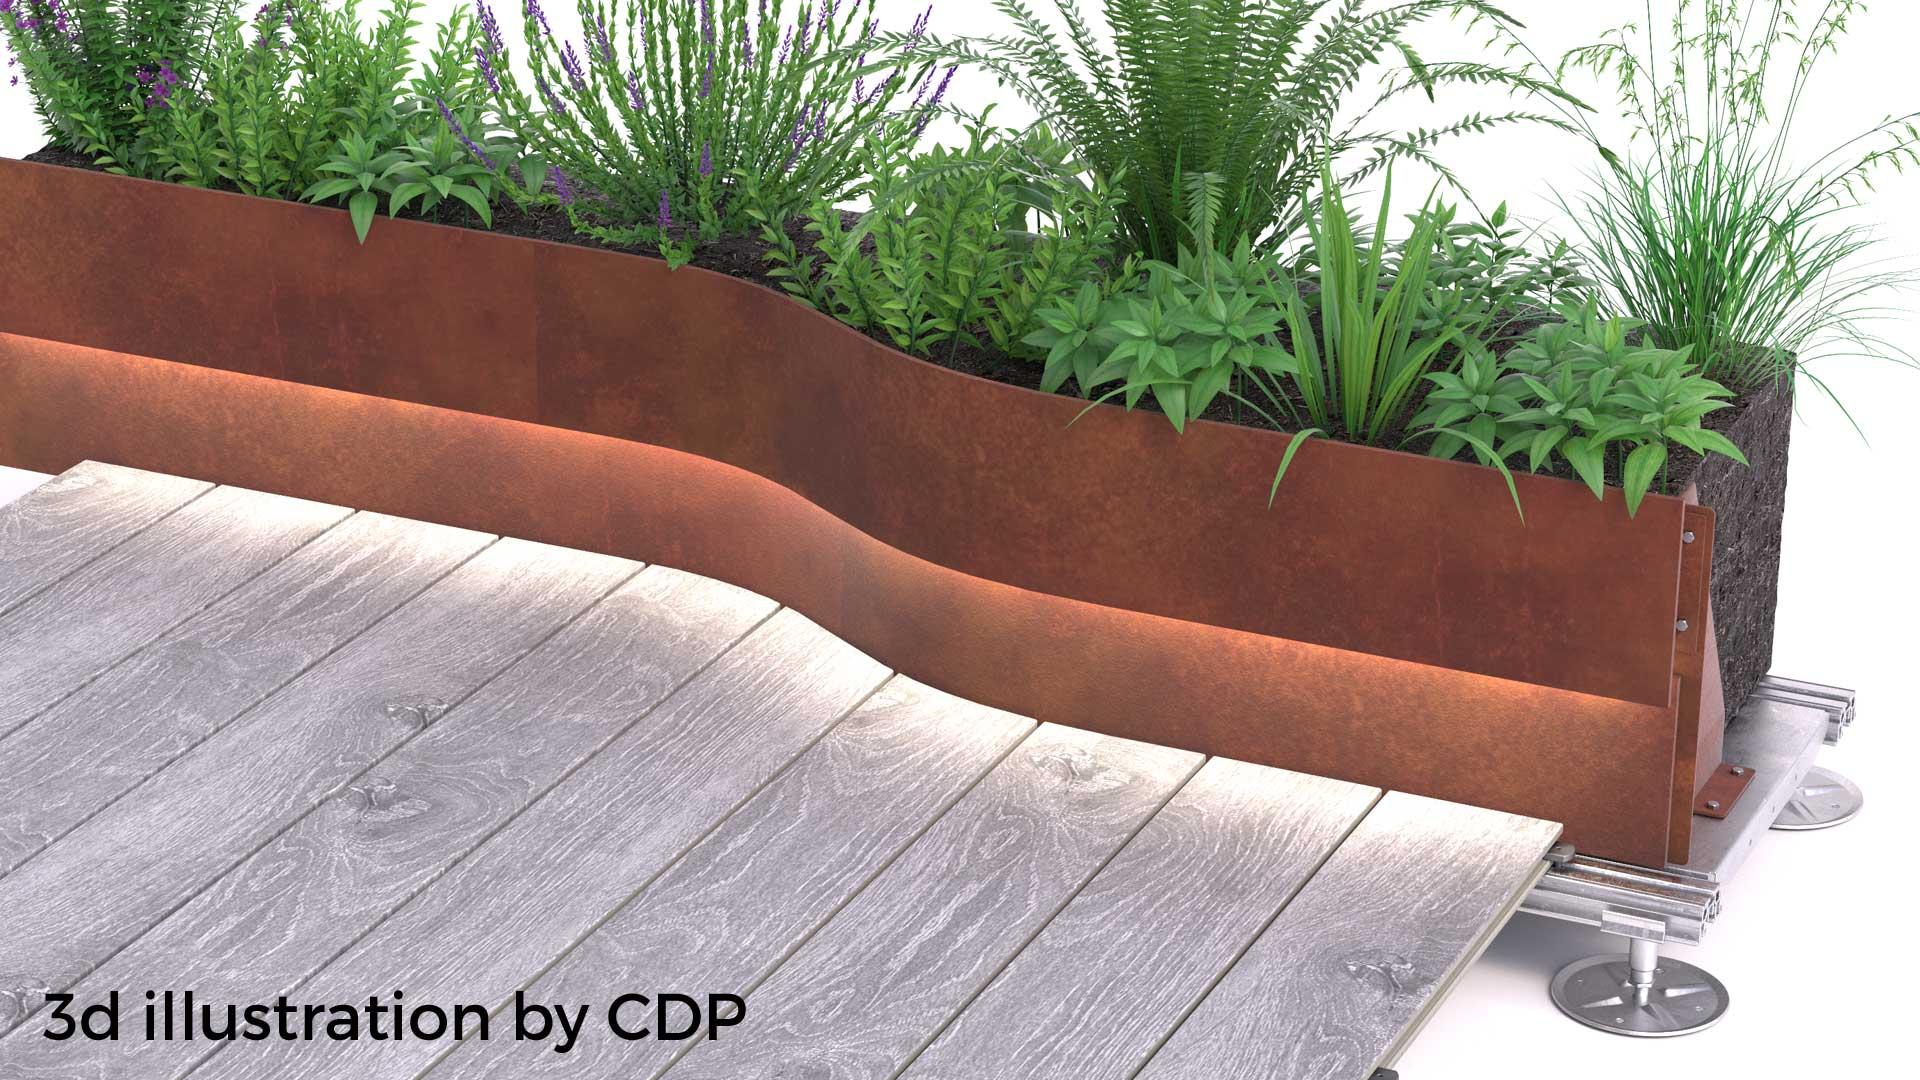 Preventa 3d illustration by CDP